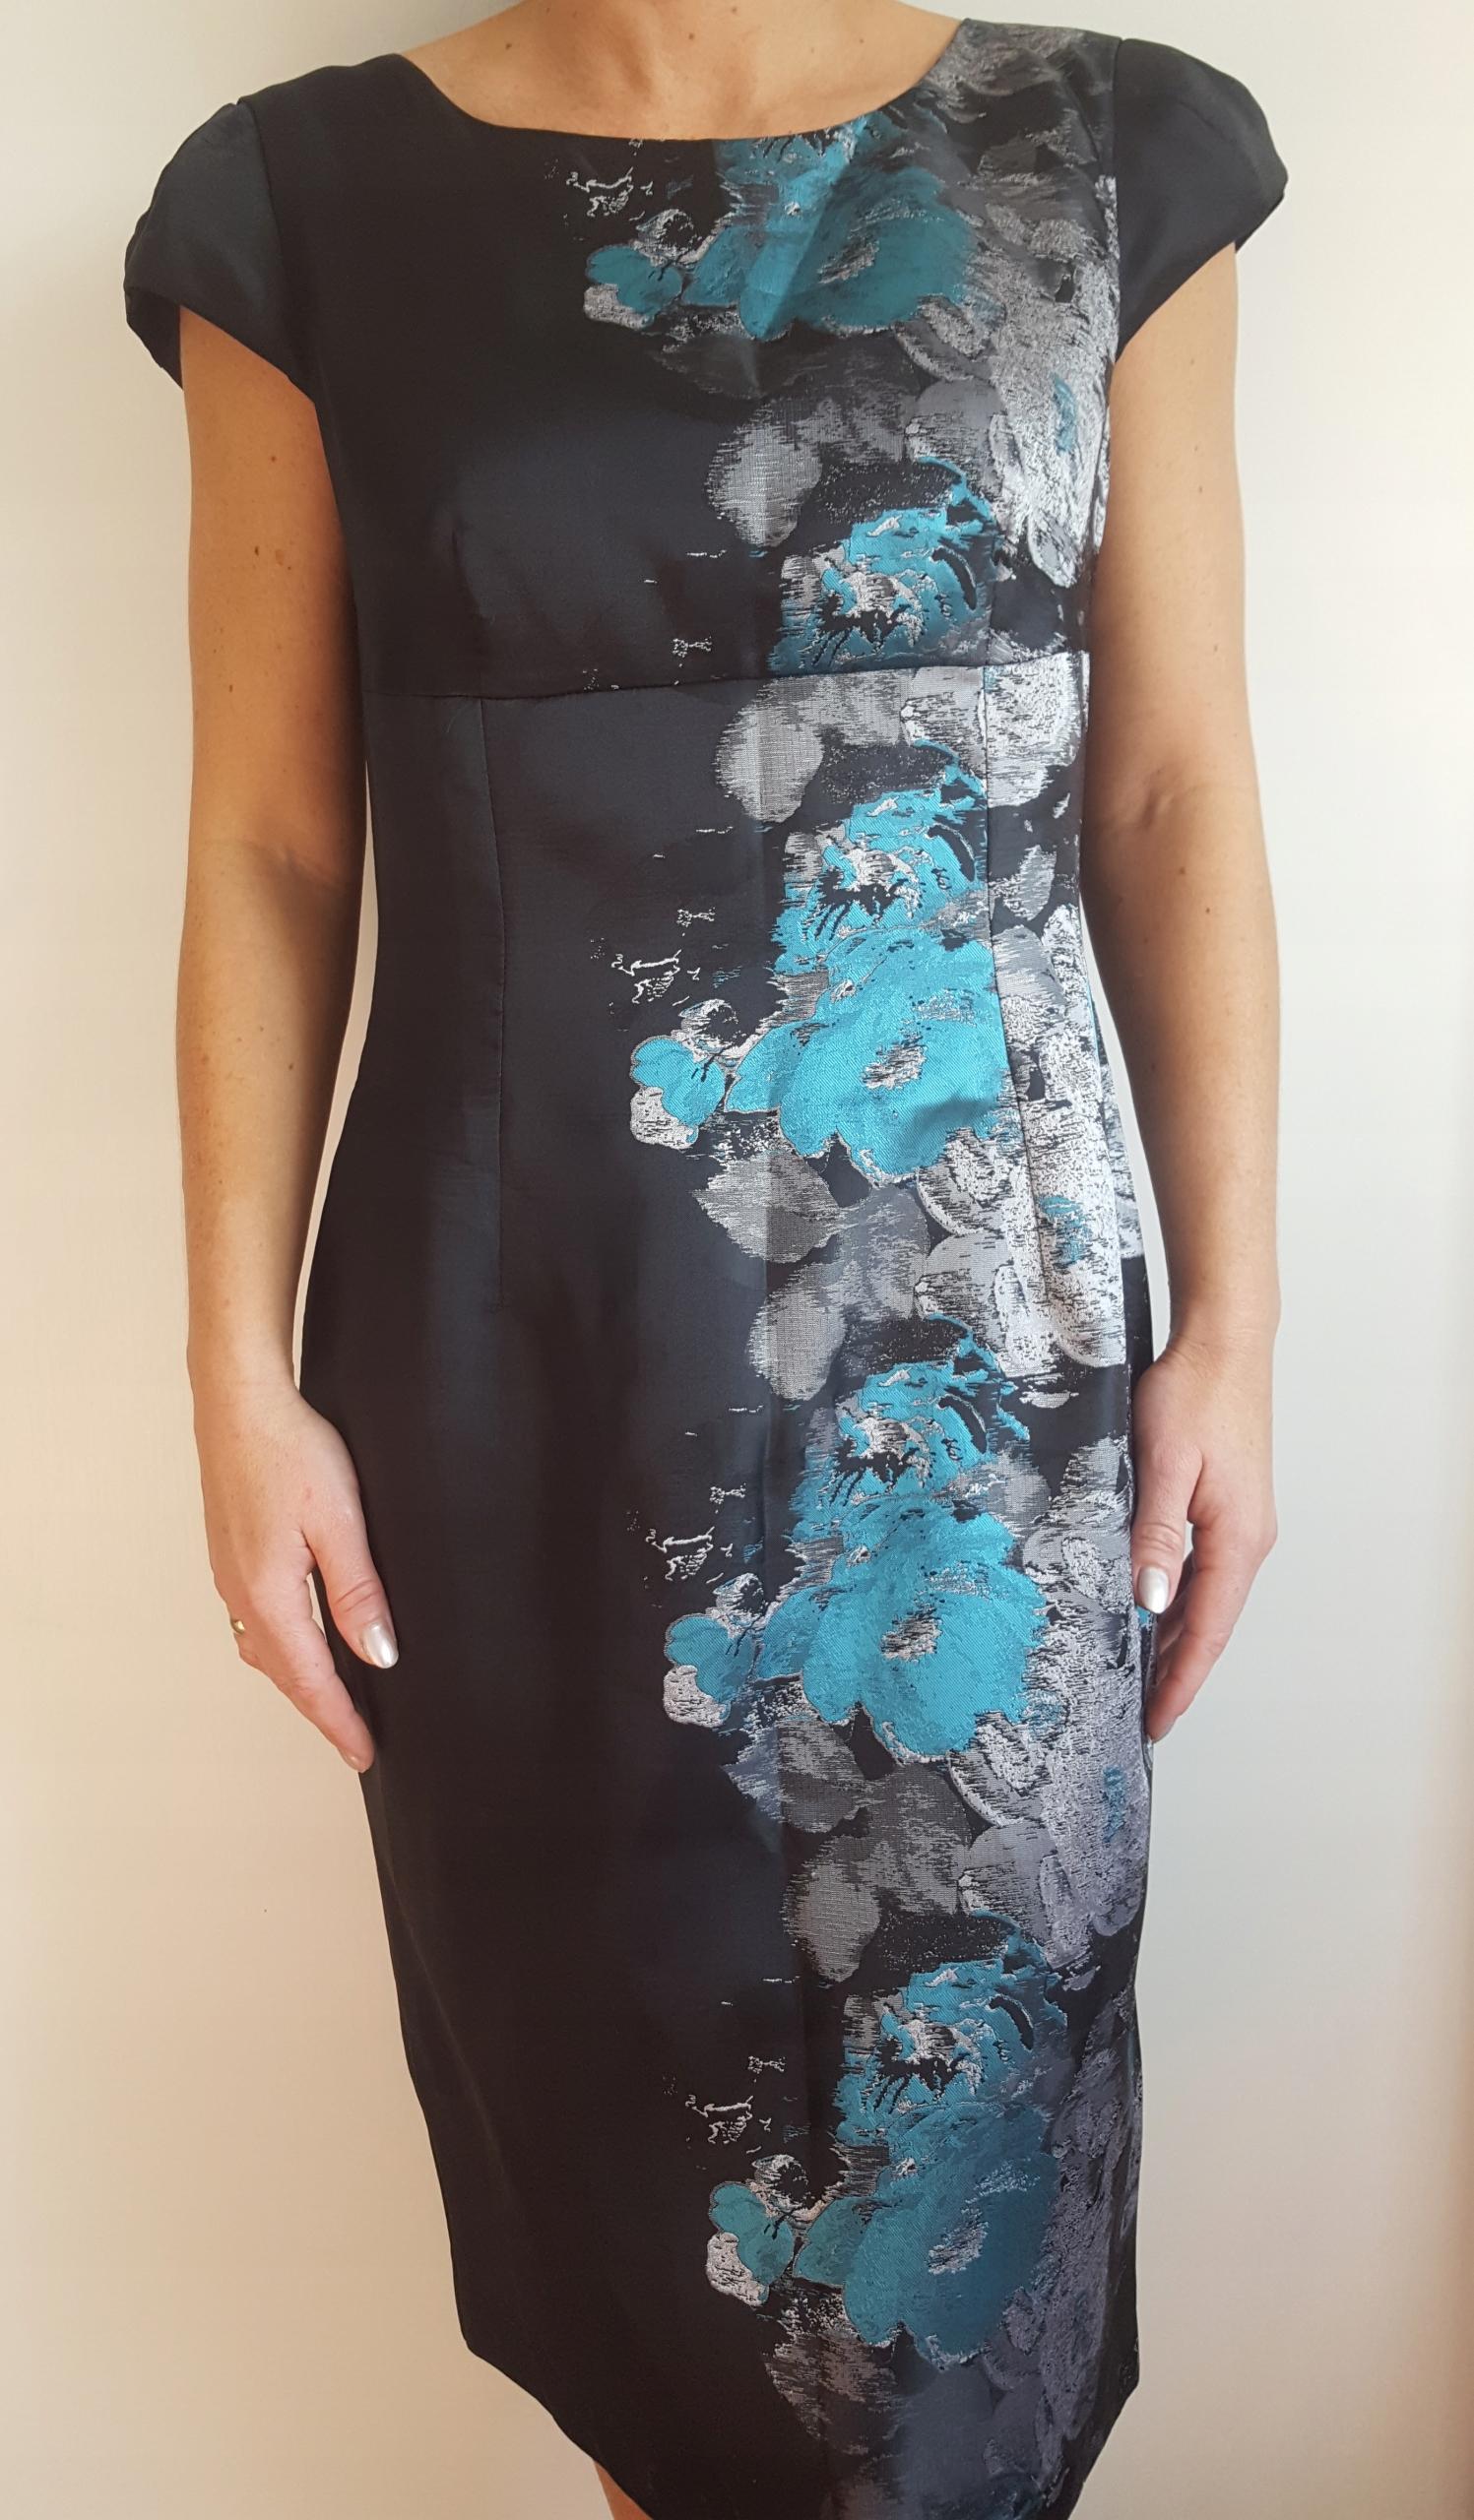 185c868b62 SALKO elegancka sukienka 38 K - 7622727609 - oficjalne archiwum allegro